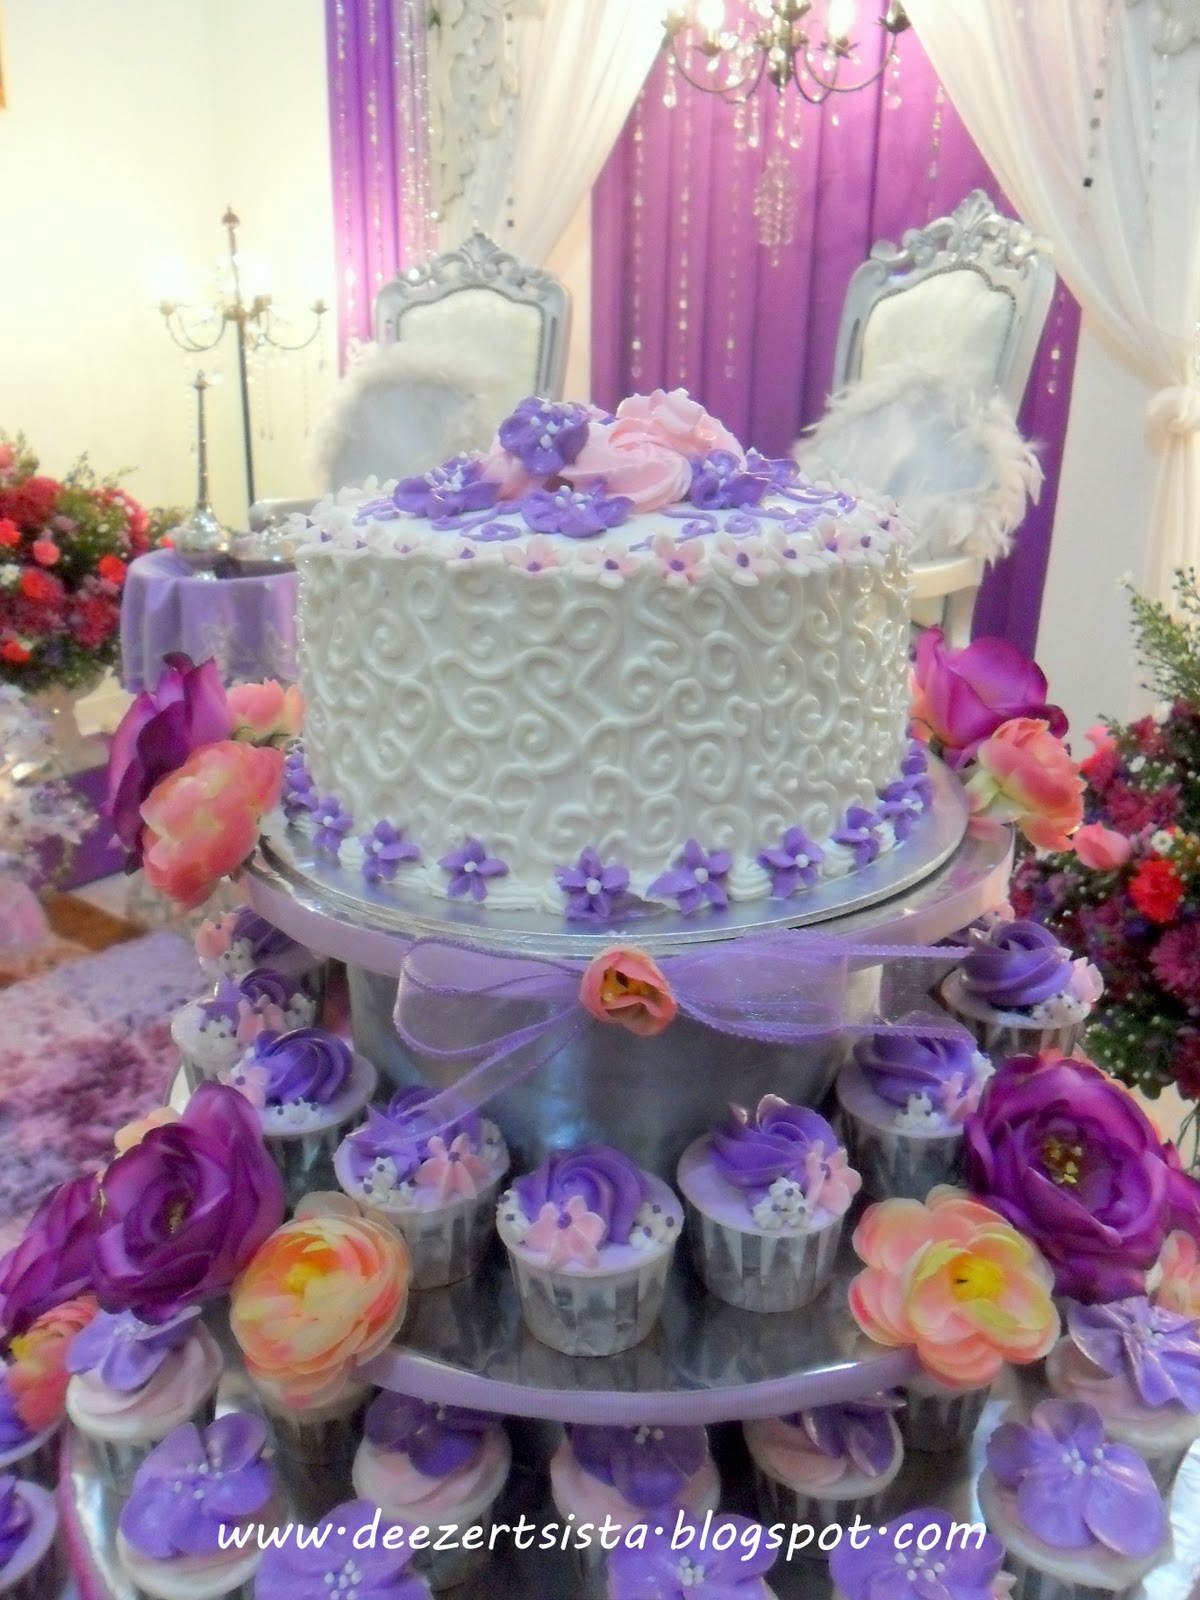 Deezert Sista By Dalila Amp Zaihan Wedding Tiered Cake